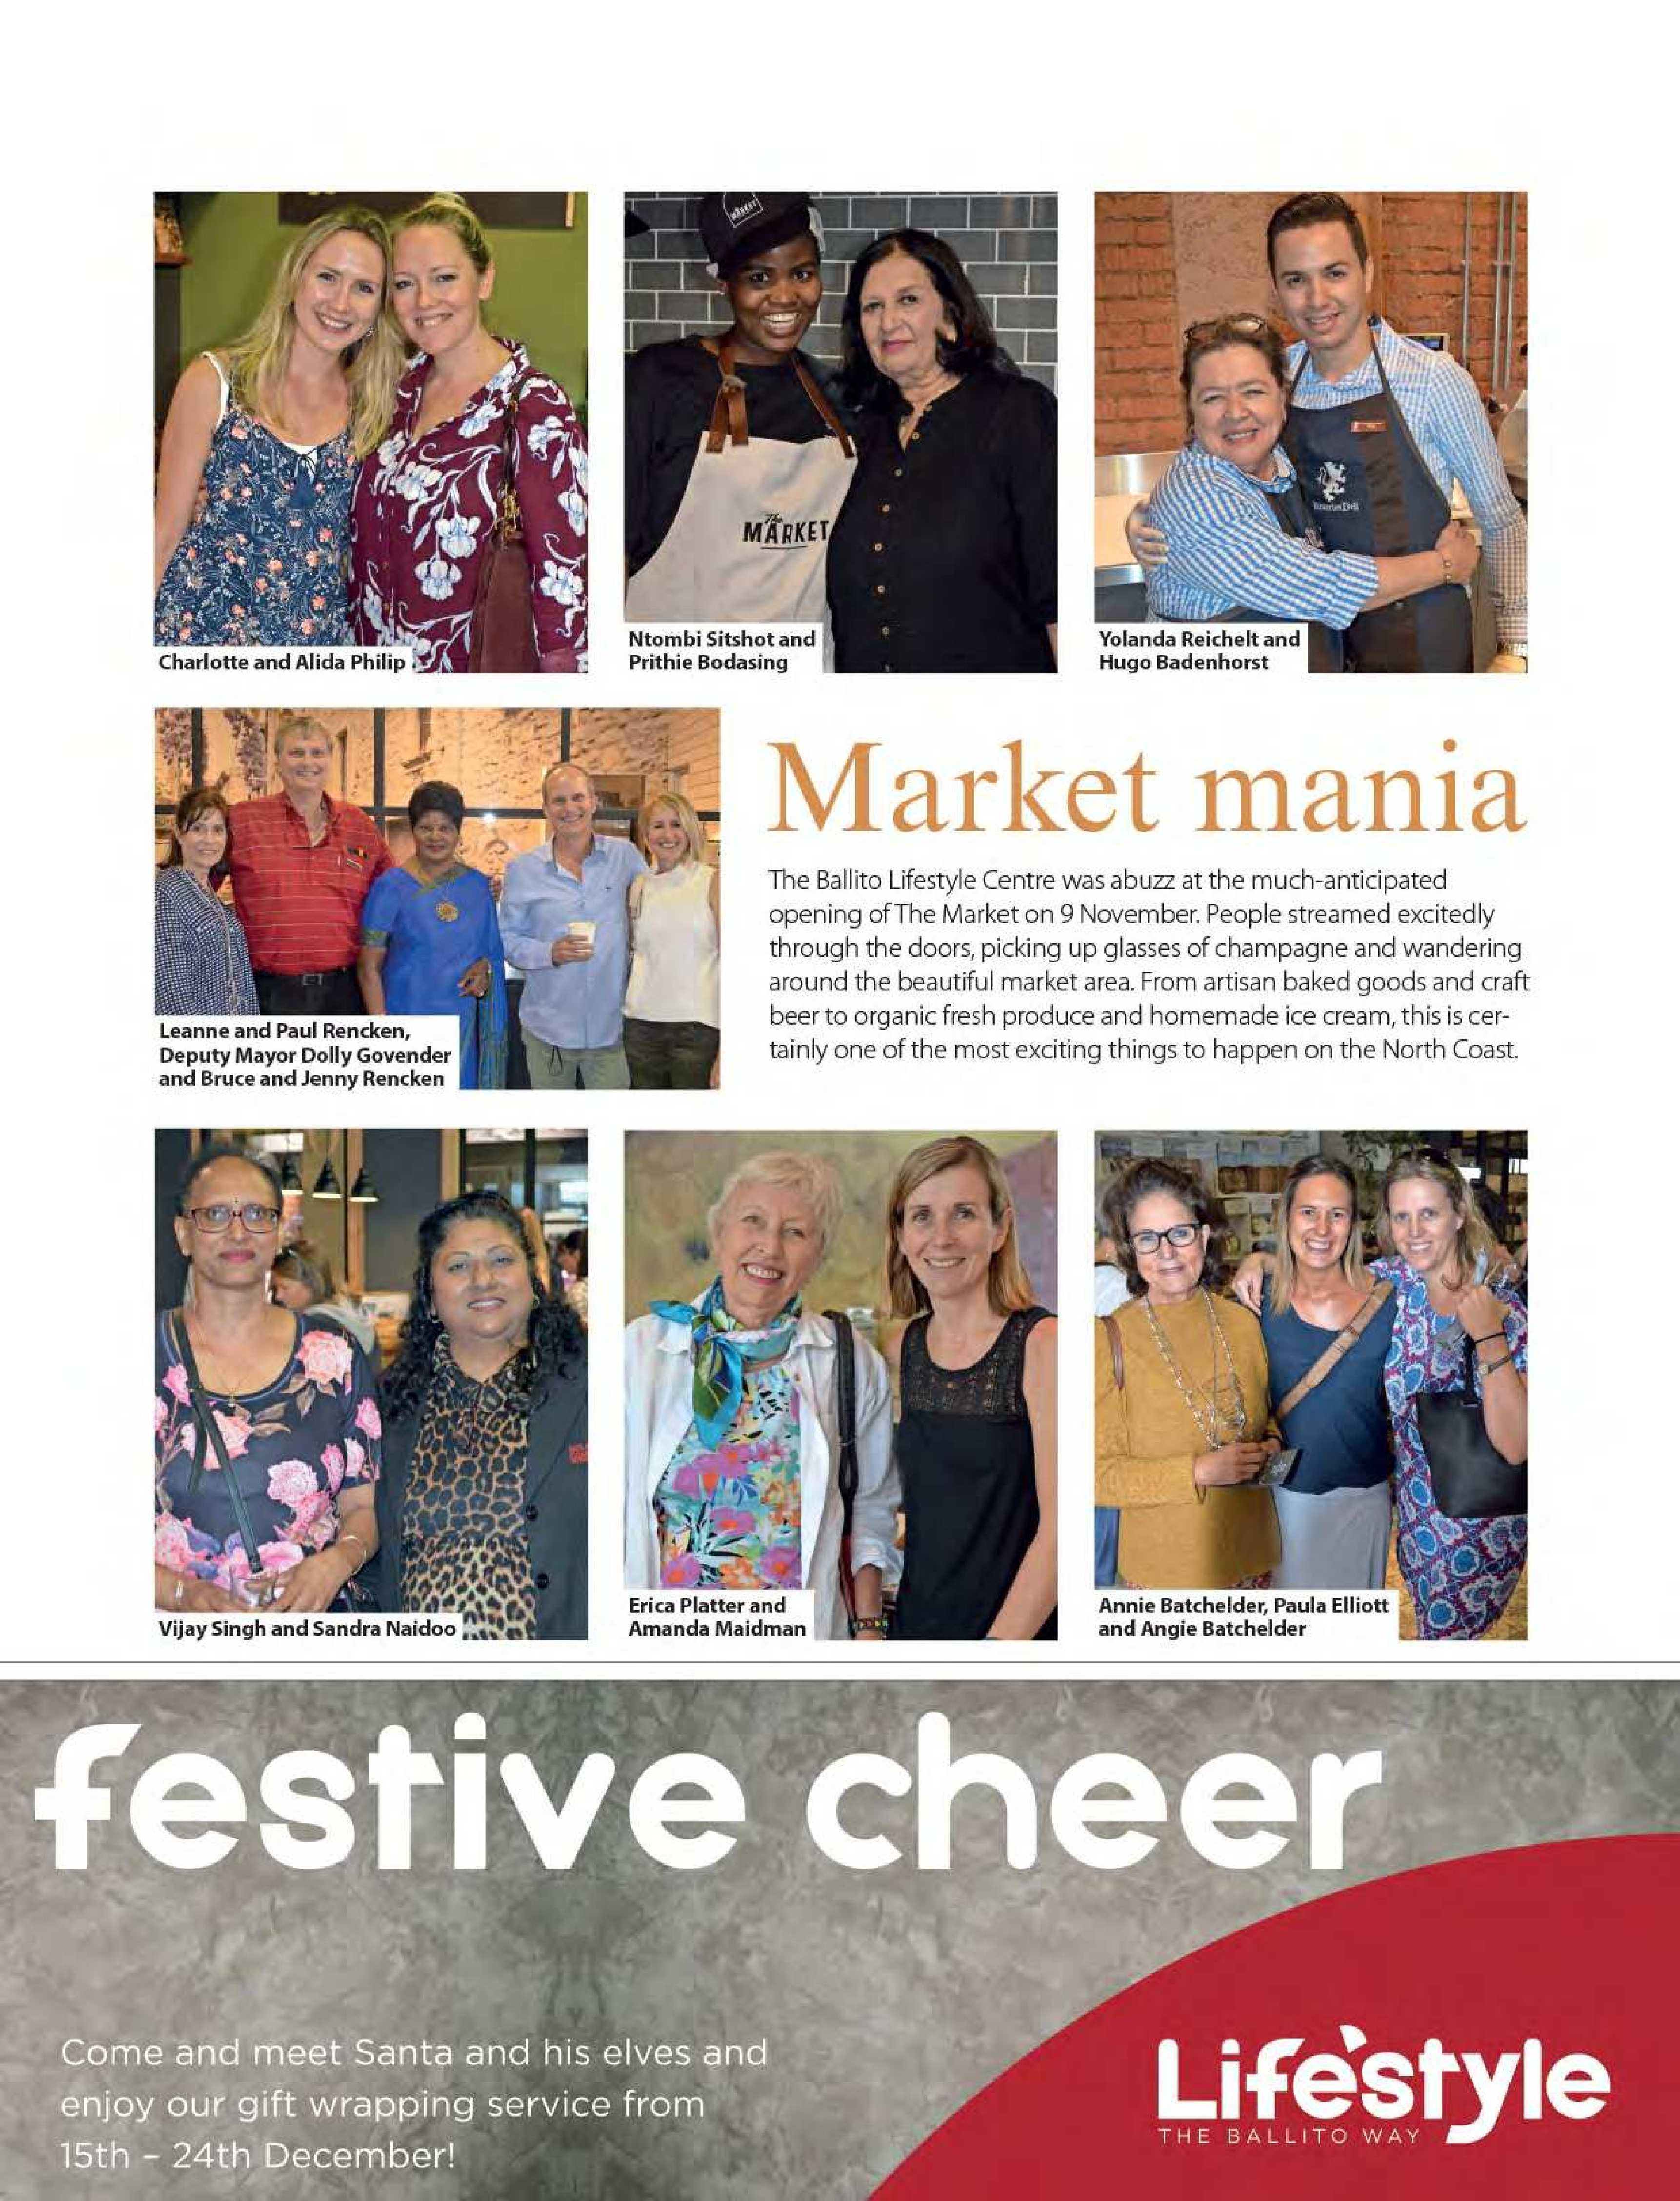 get-magazine-ballitoumhlanga-december-2017-january-2018-2-epapers-page-15